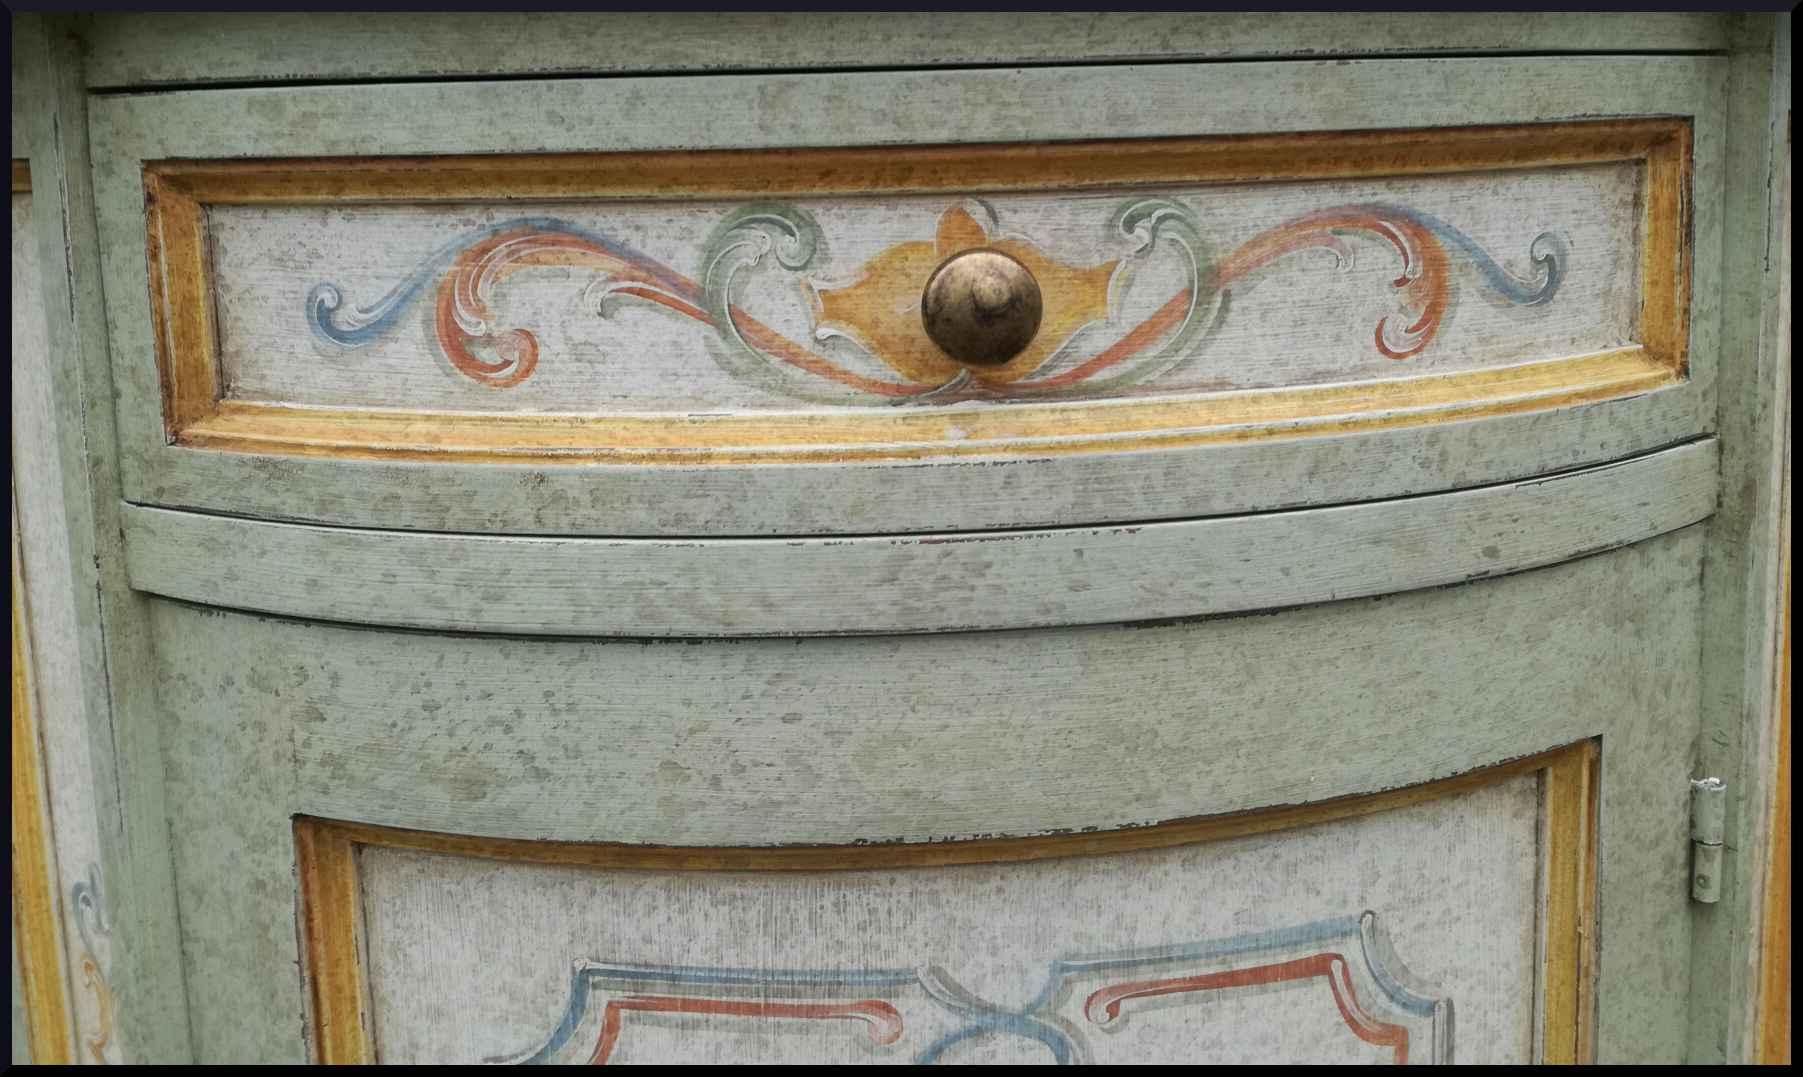 Angoliera cantonale dipinta e decorata